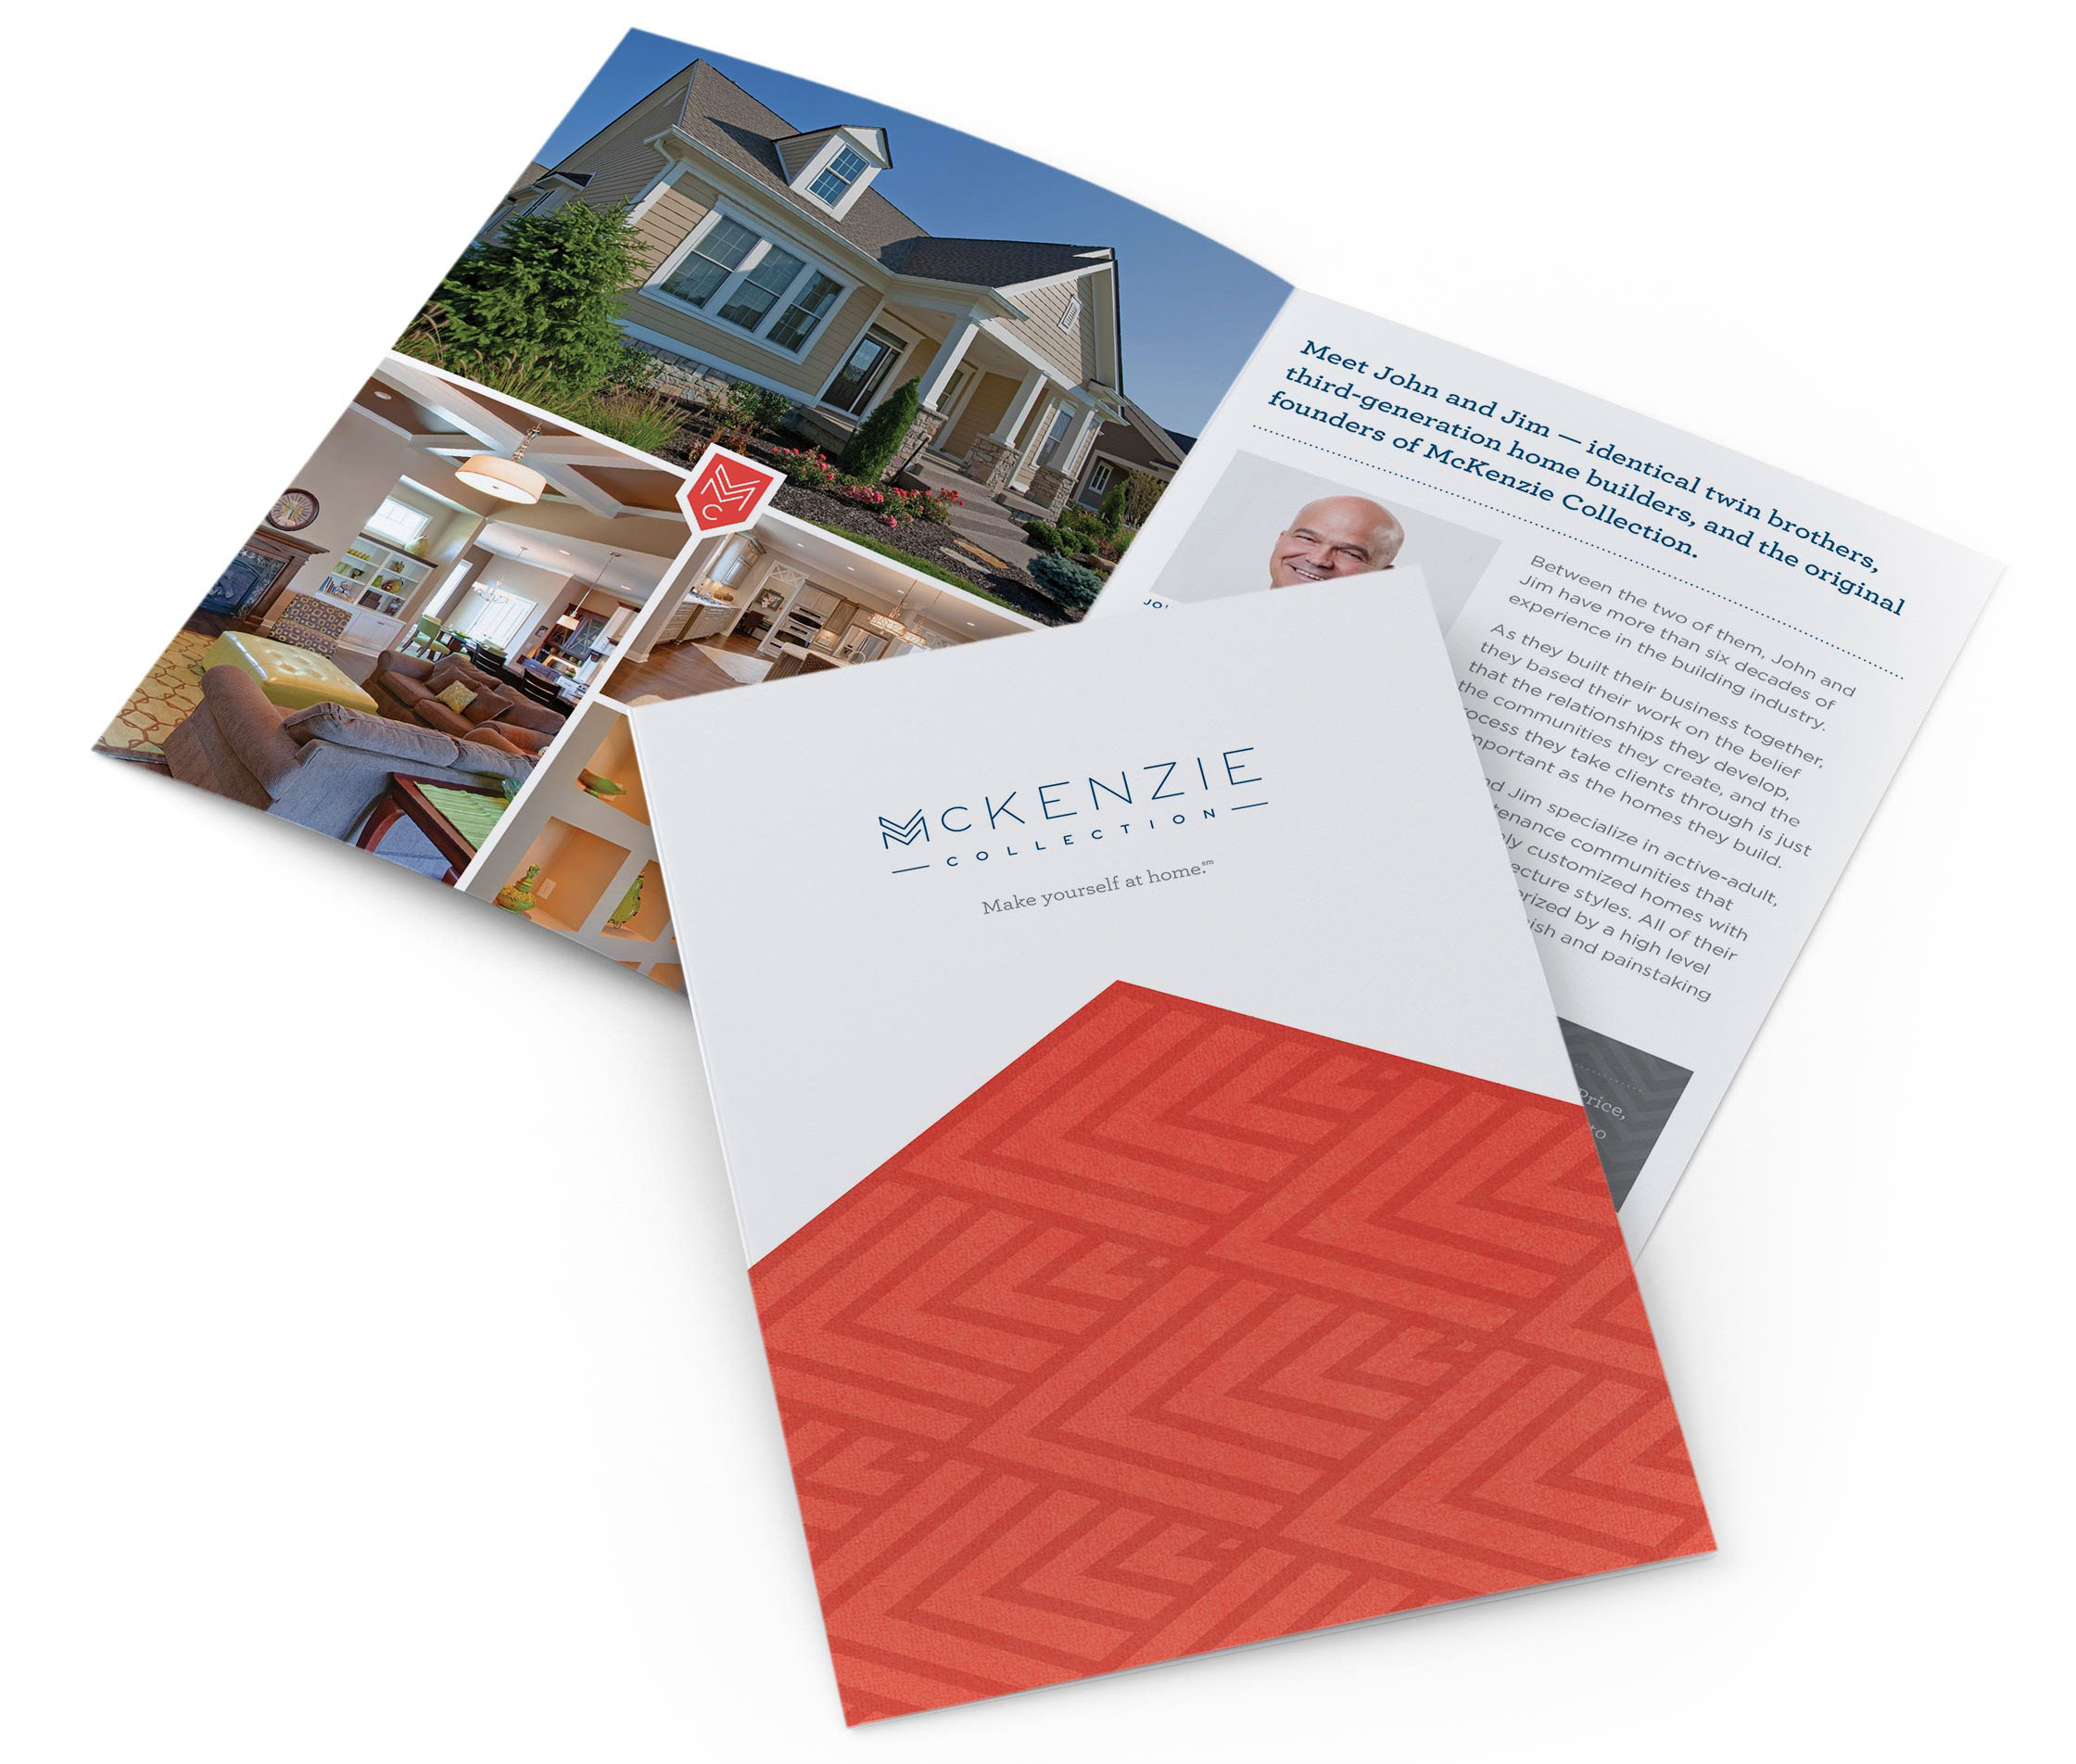 McKenzie Collection Brochure